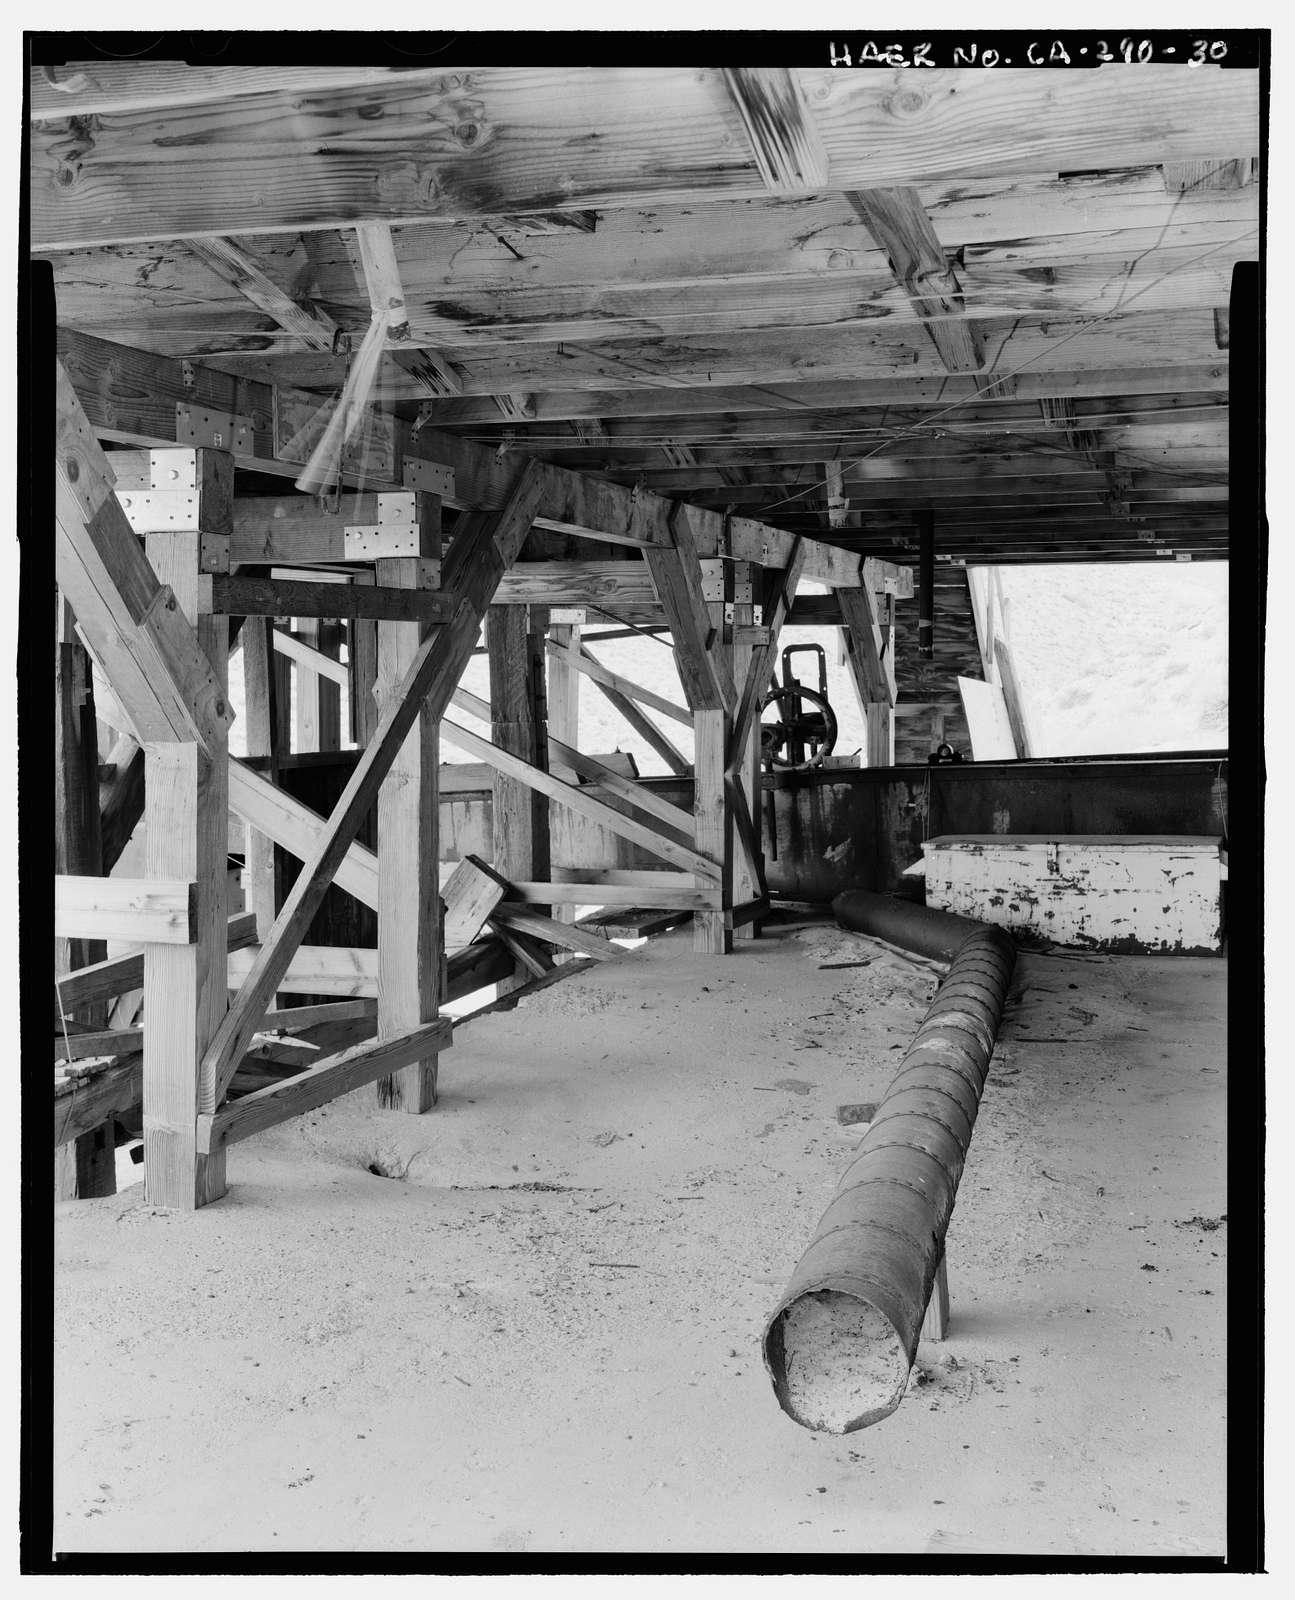 Skidoo Mine, Park Route 38 (Skidoo Road), Death Valley Junction, Inyo County, CA